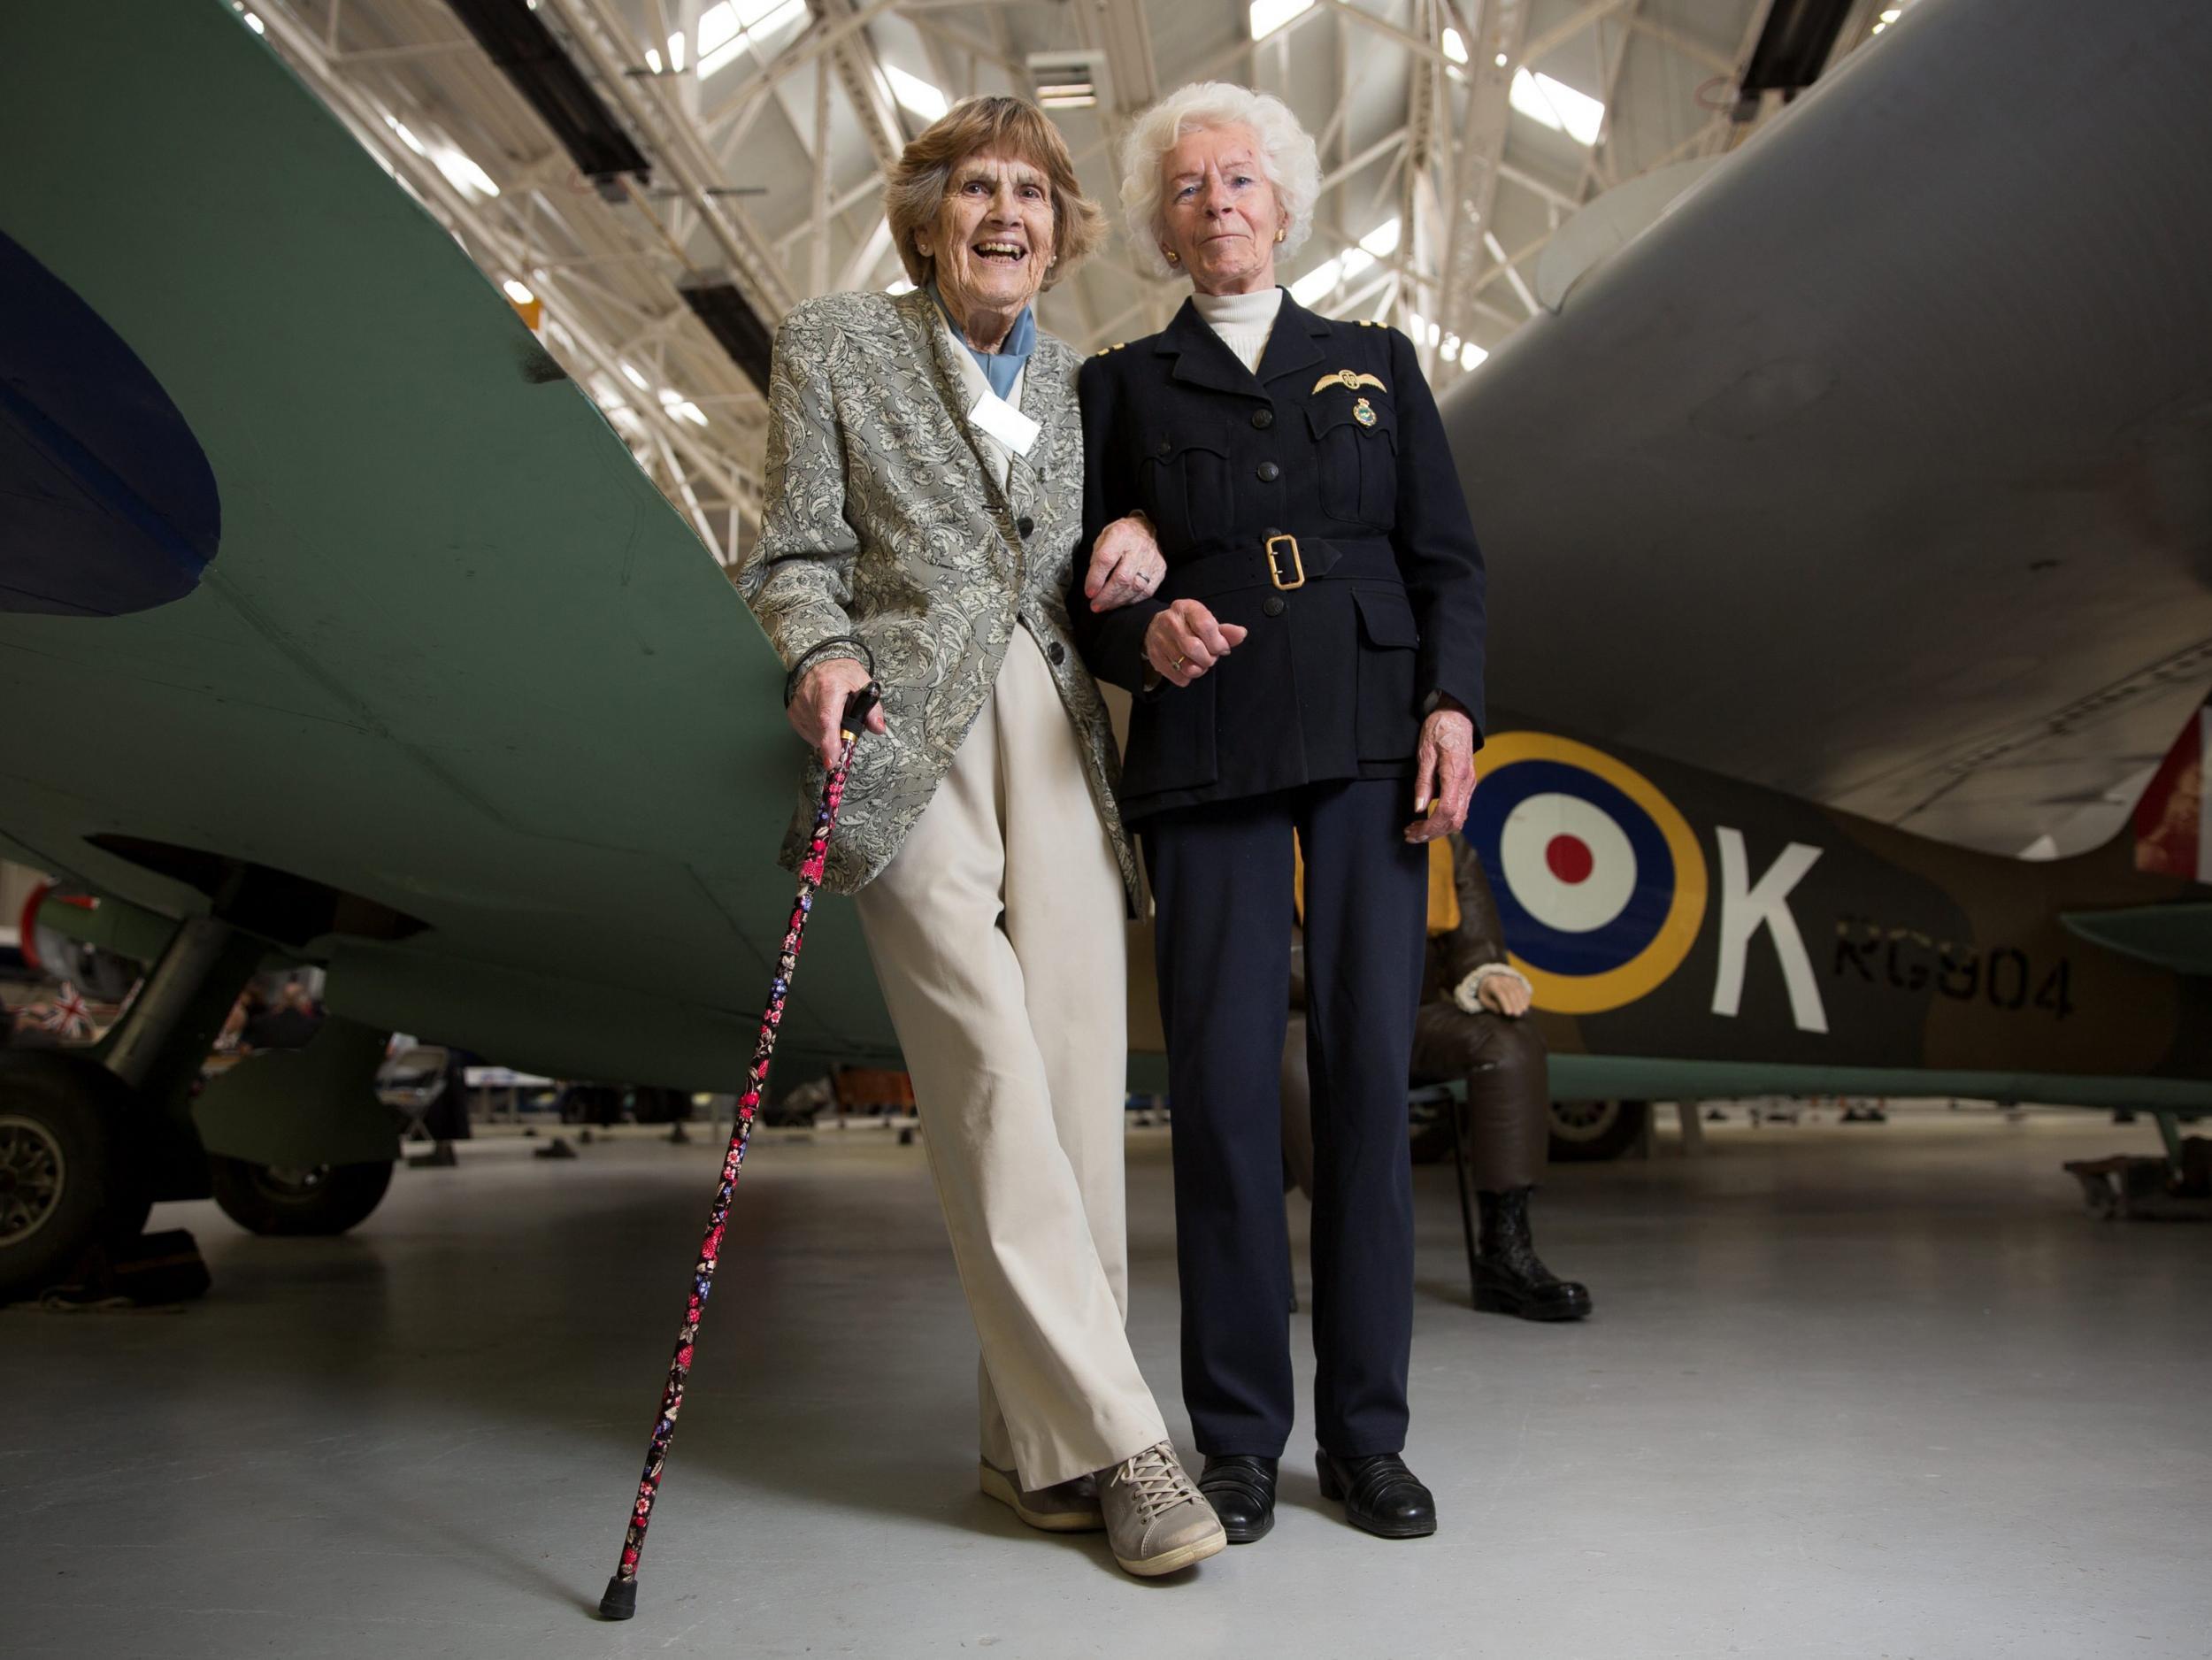 Spitfire Pilots WWII-Extraordinary Women